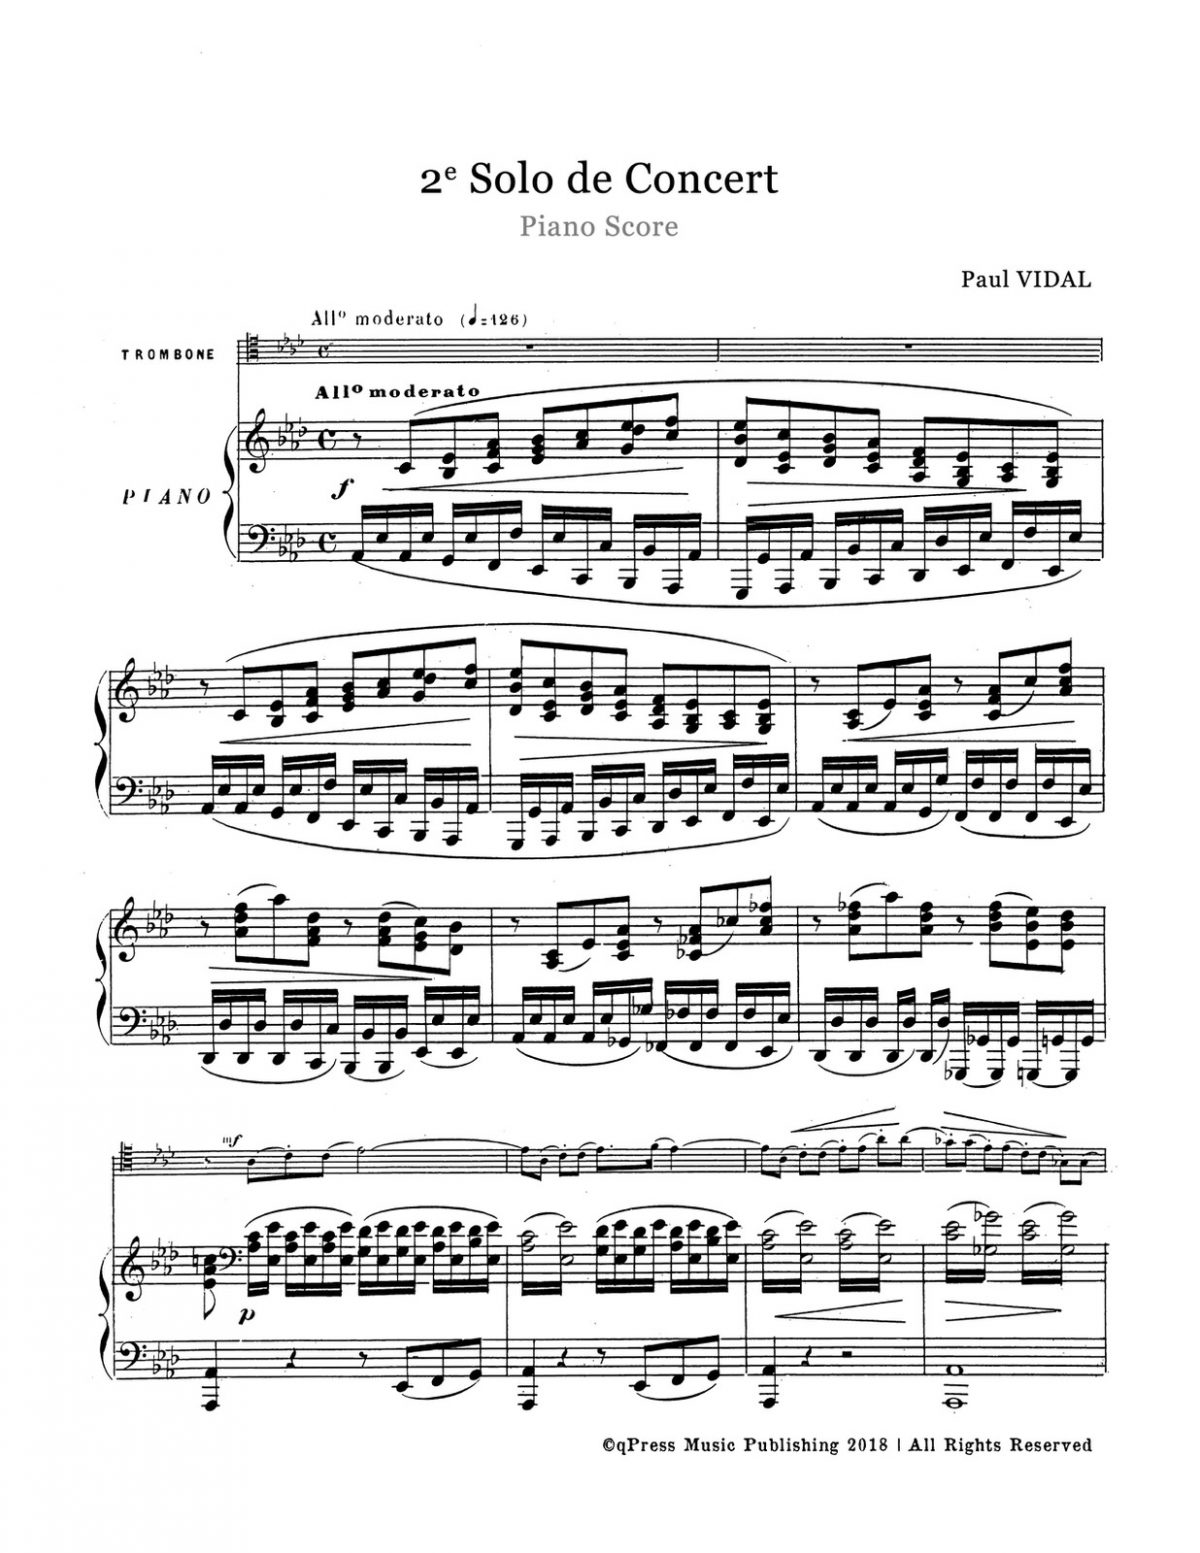 Vidal, 2e Solo de Concert-p07